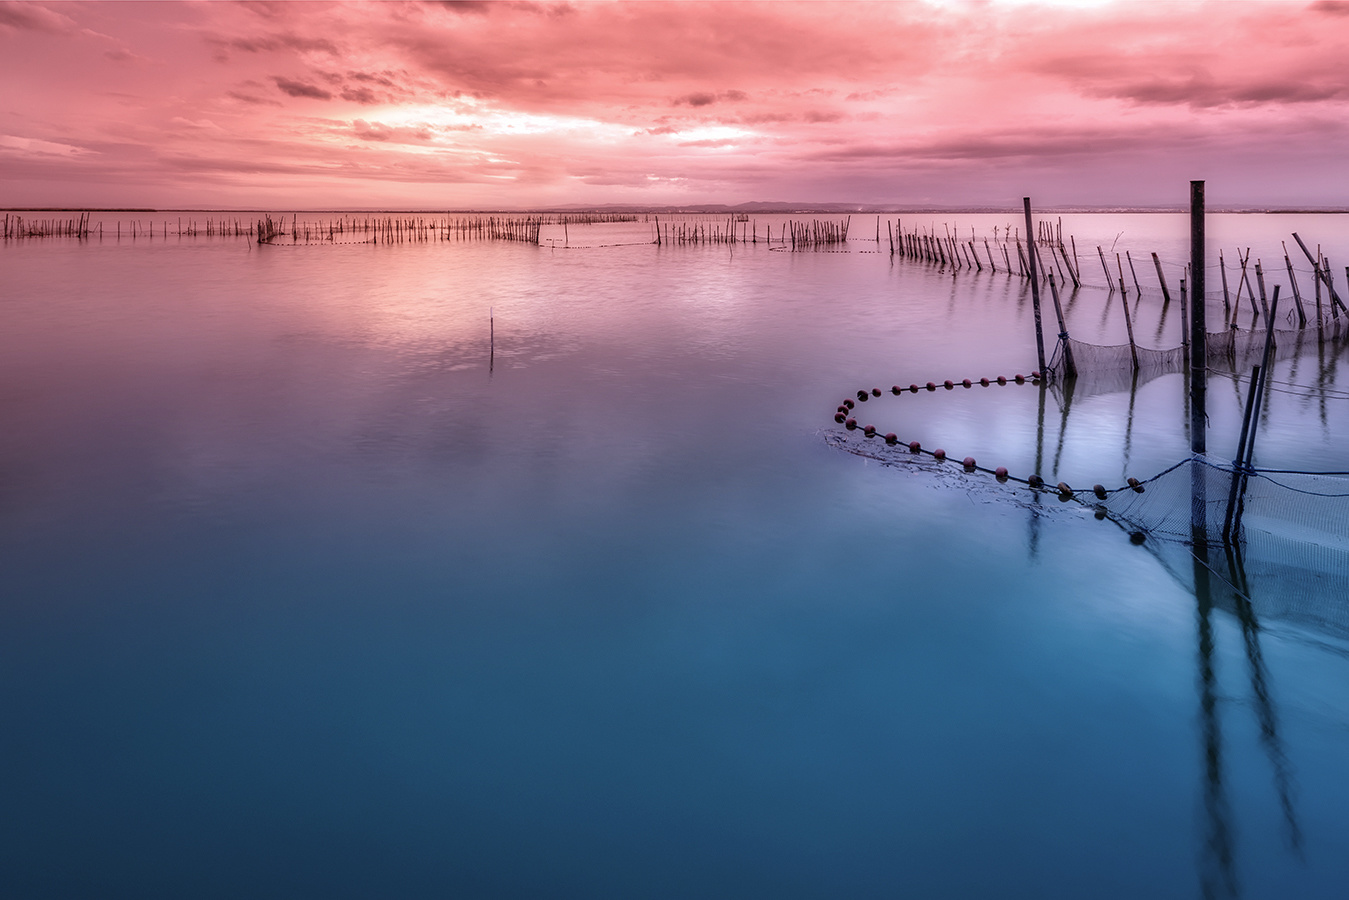 Fishing day by Hanaa Turkistani